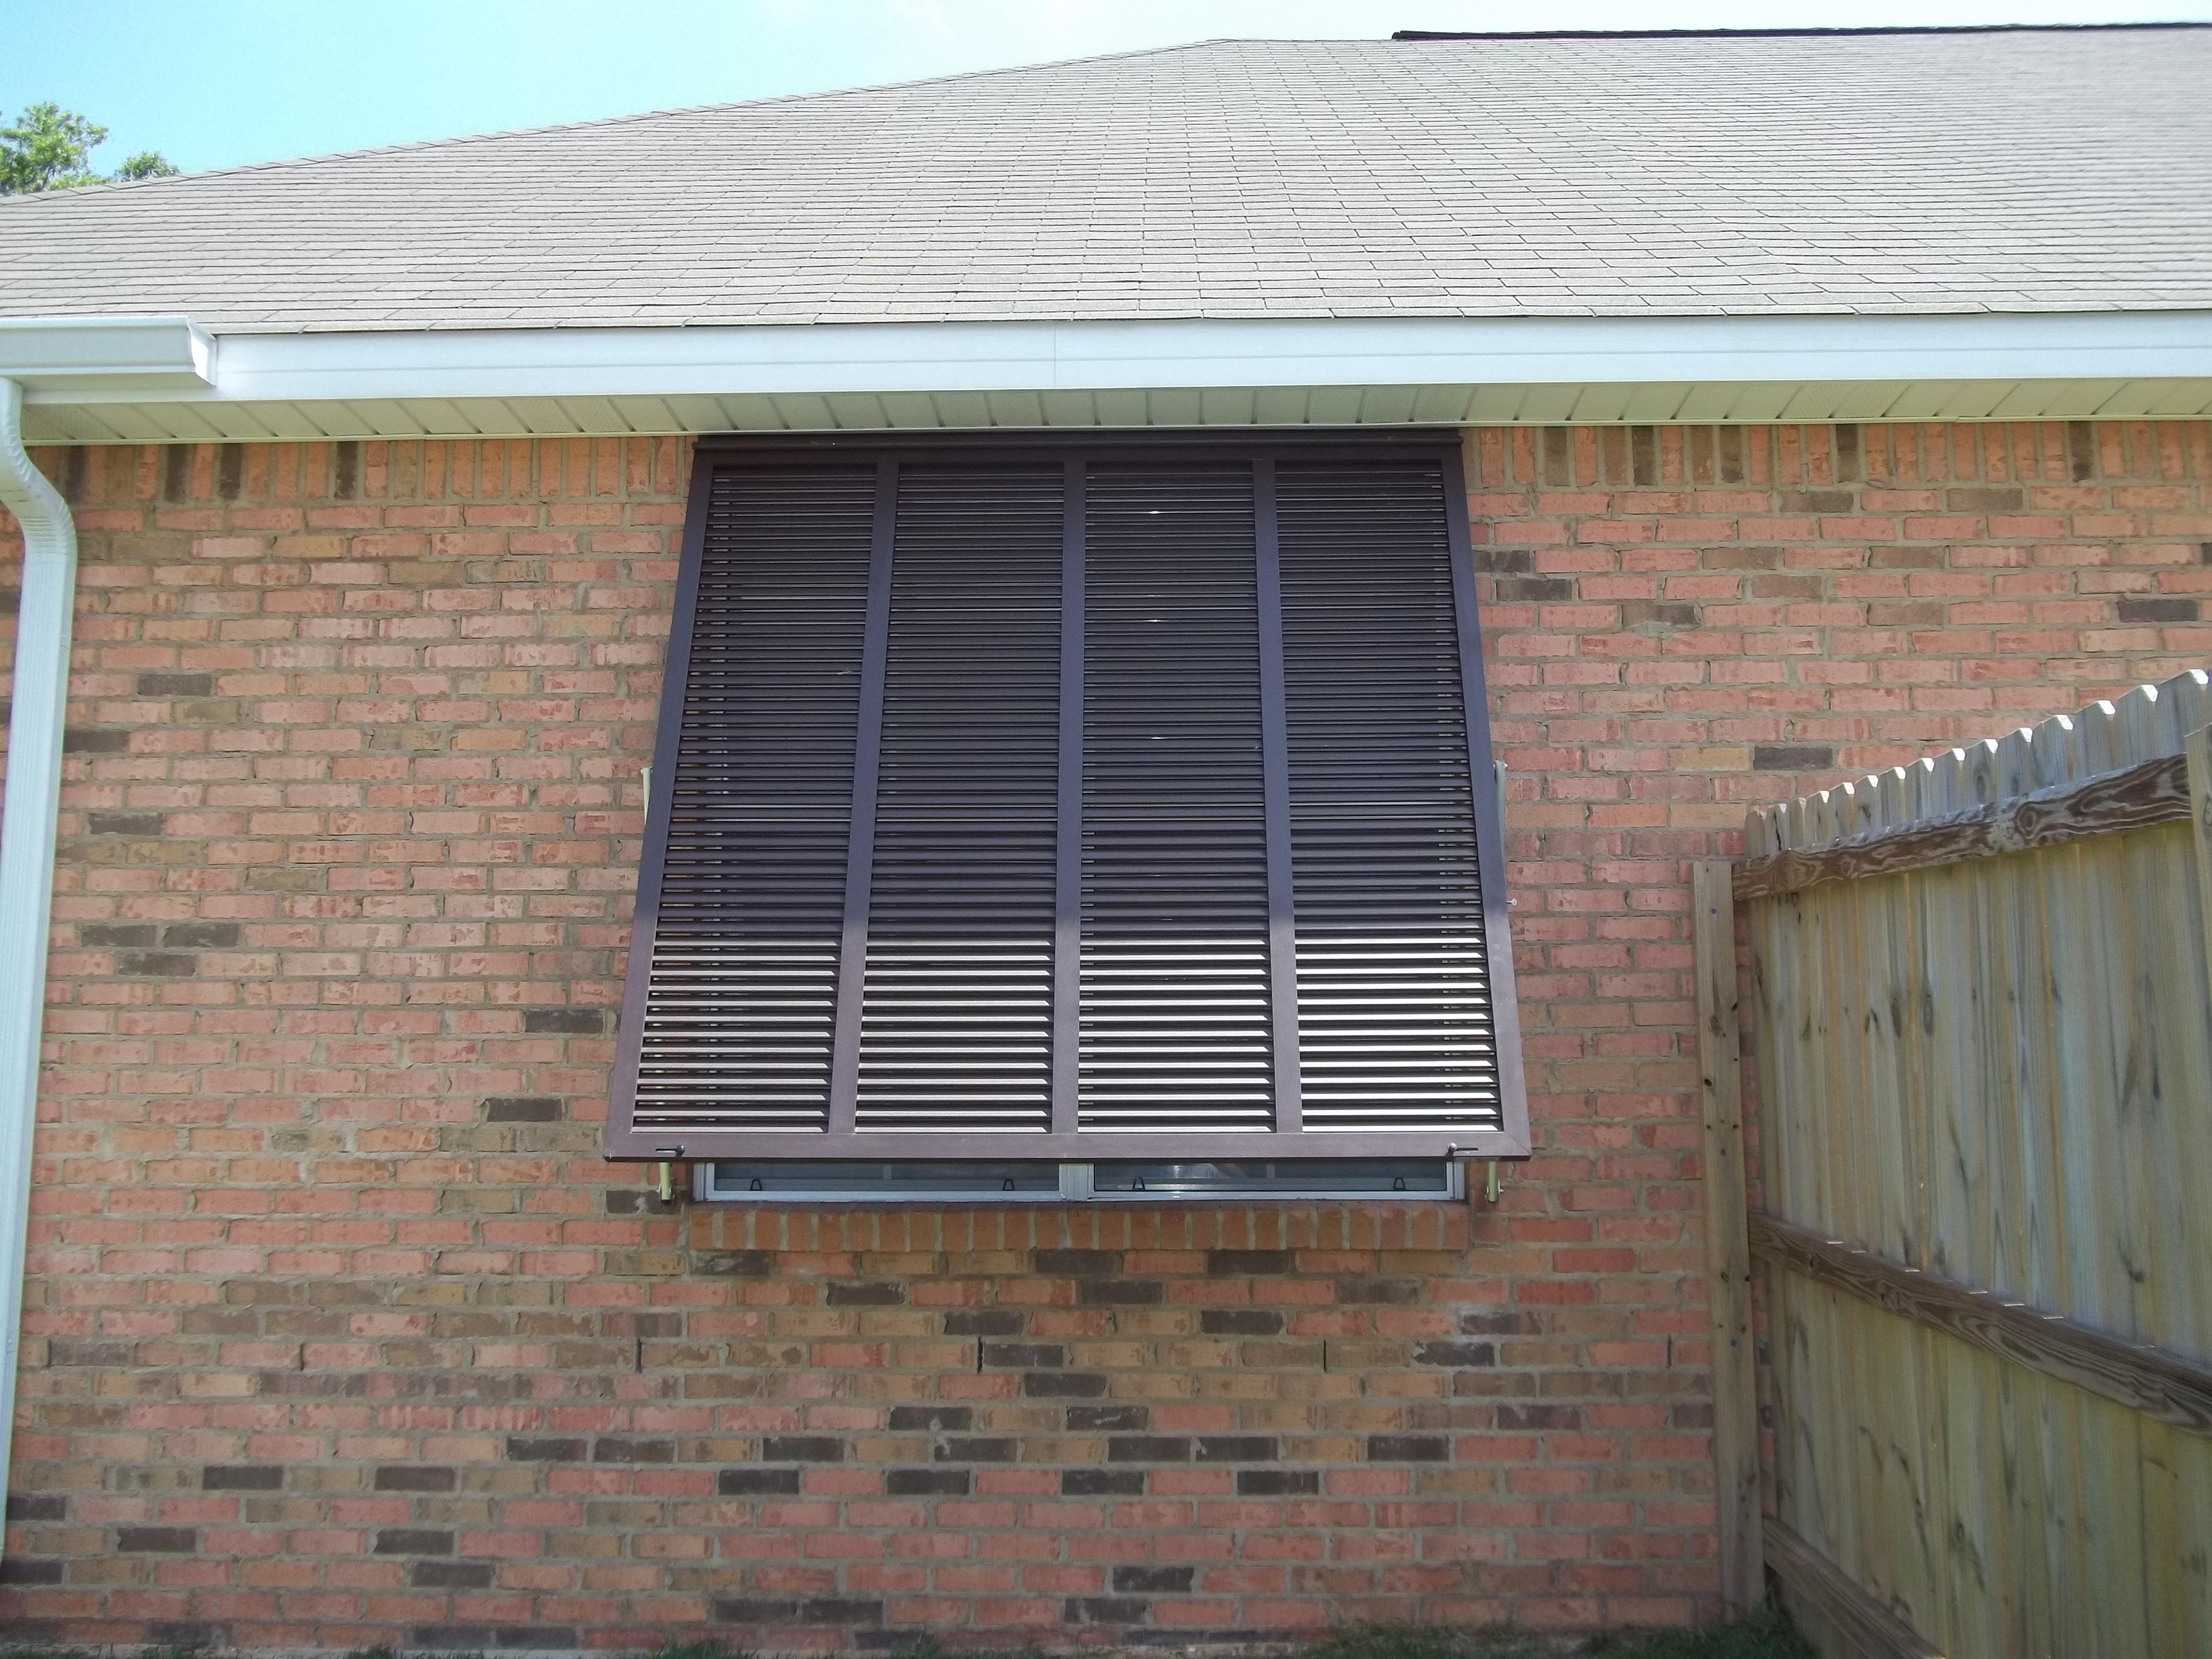 Blog archives backupergetmy for Local garage door